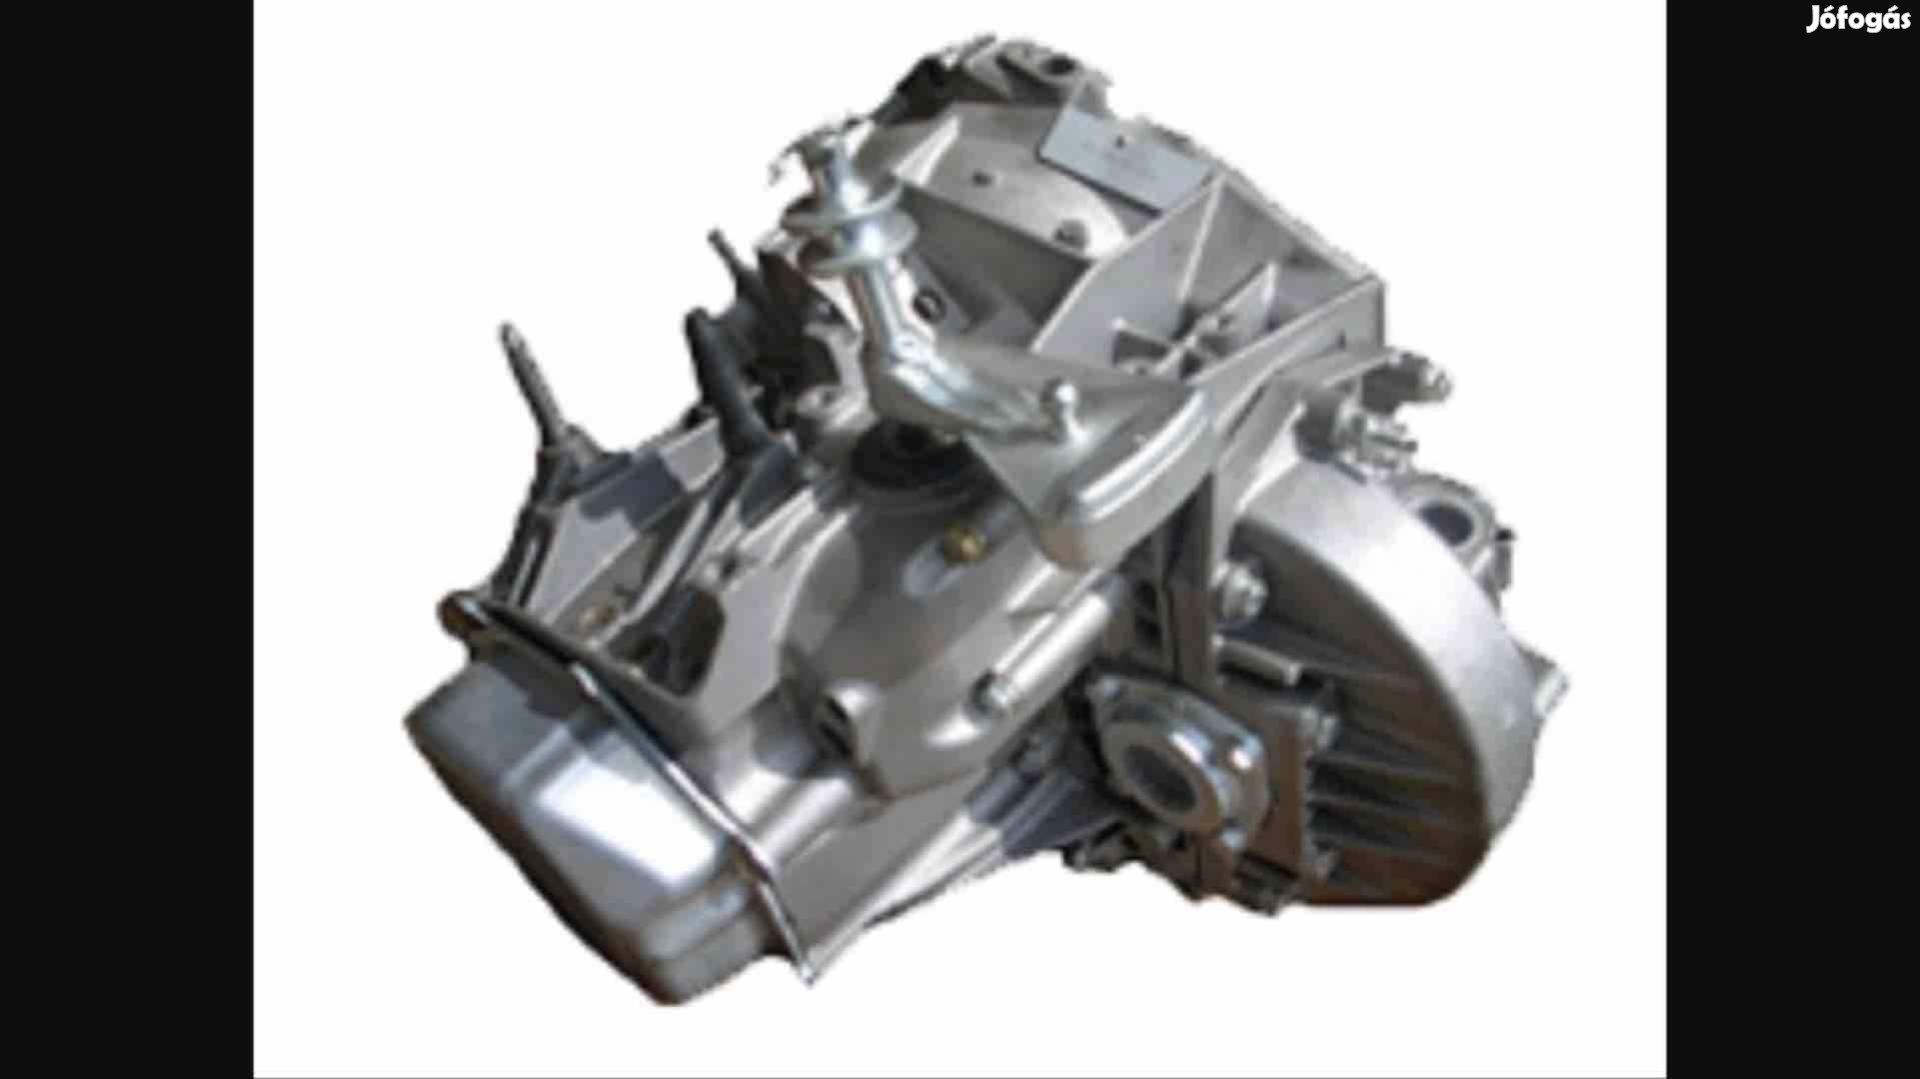 Opel Vivaro Primastar 1.6cdti 1.9dti 2.0cdti 2.5dci Pk5 Pk6 PF6 váltó